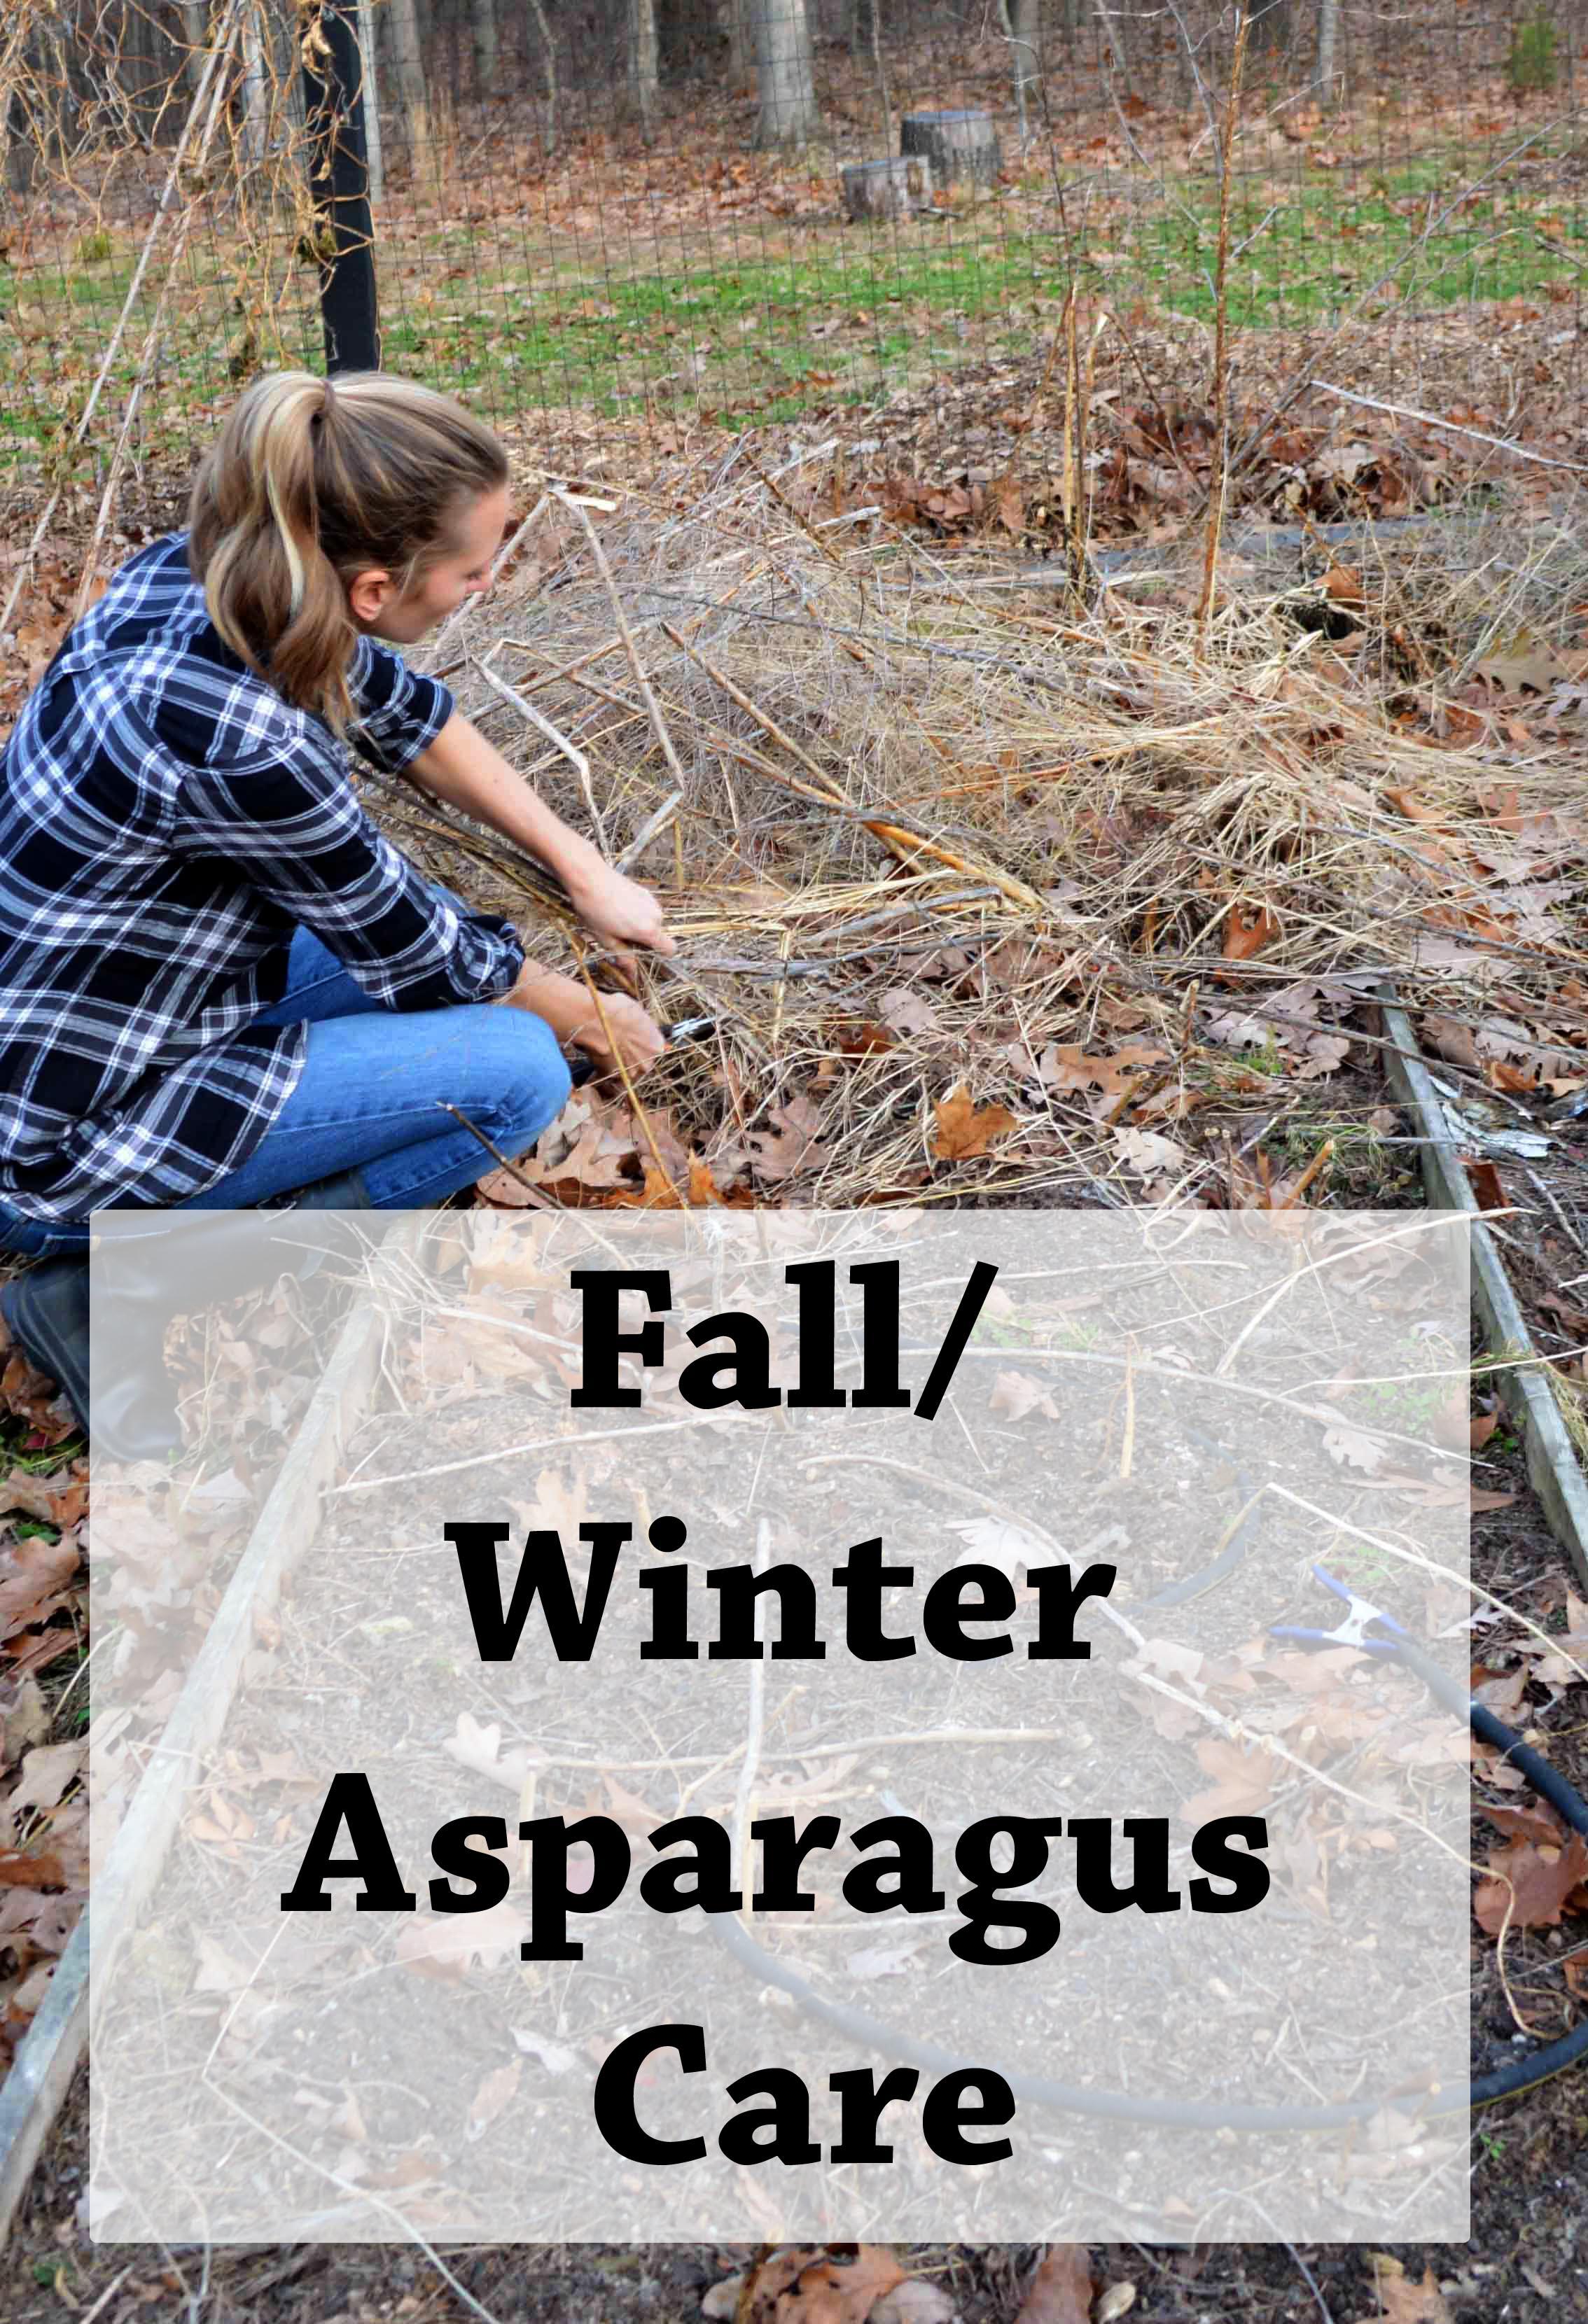 Fall Winter Asparagus Care.jpg